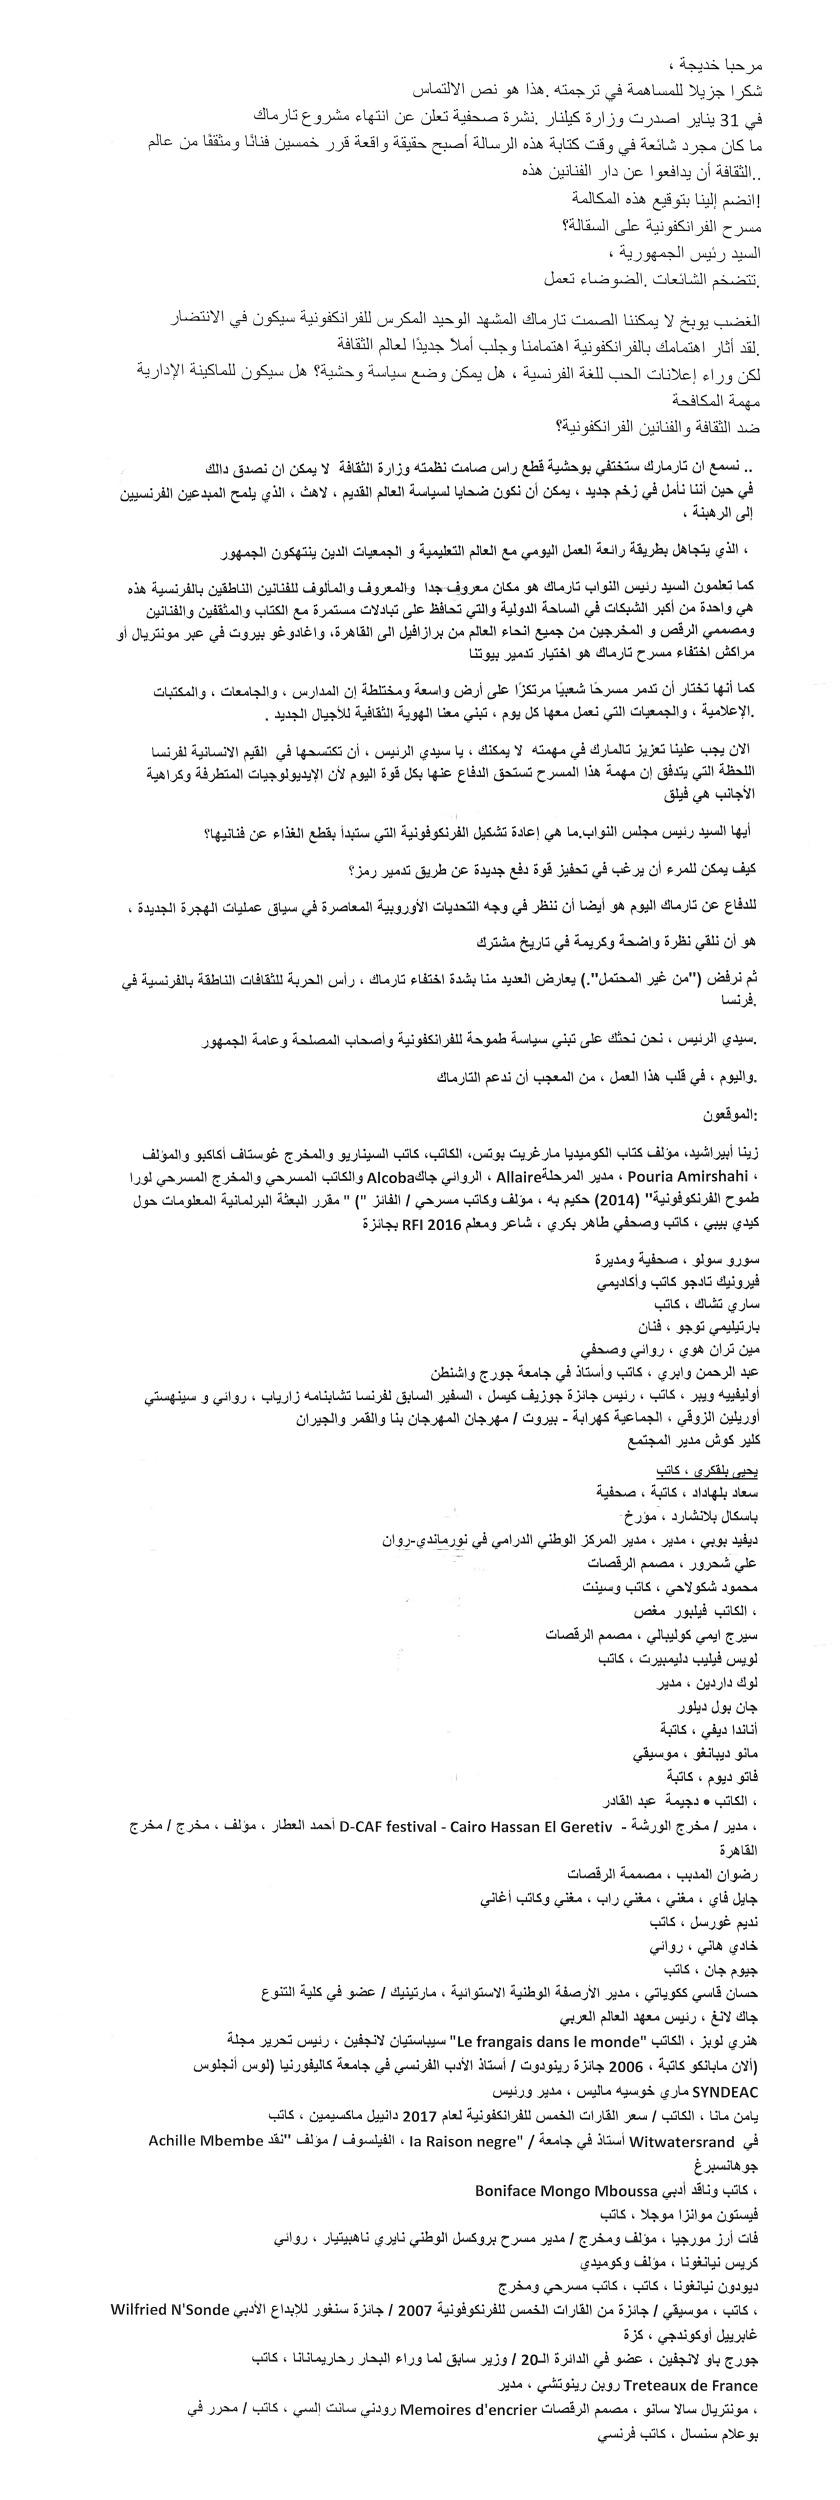 petition-tarmac-arabe.jpg